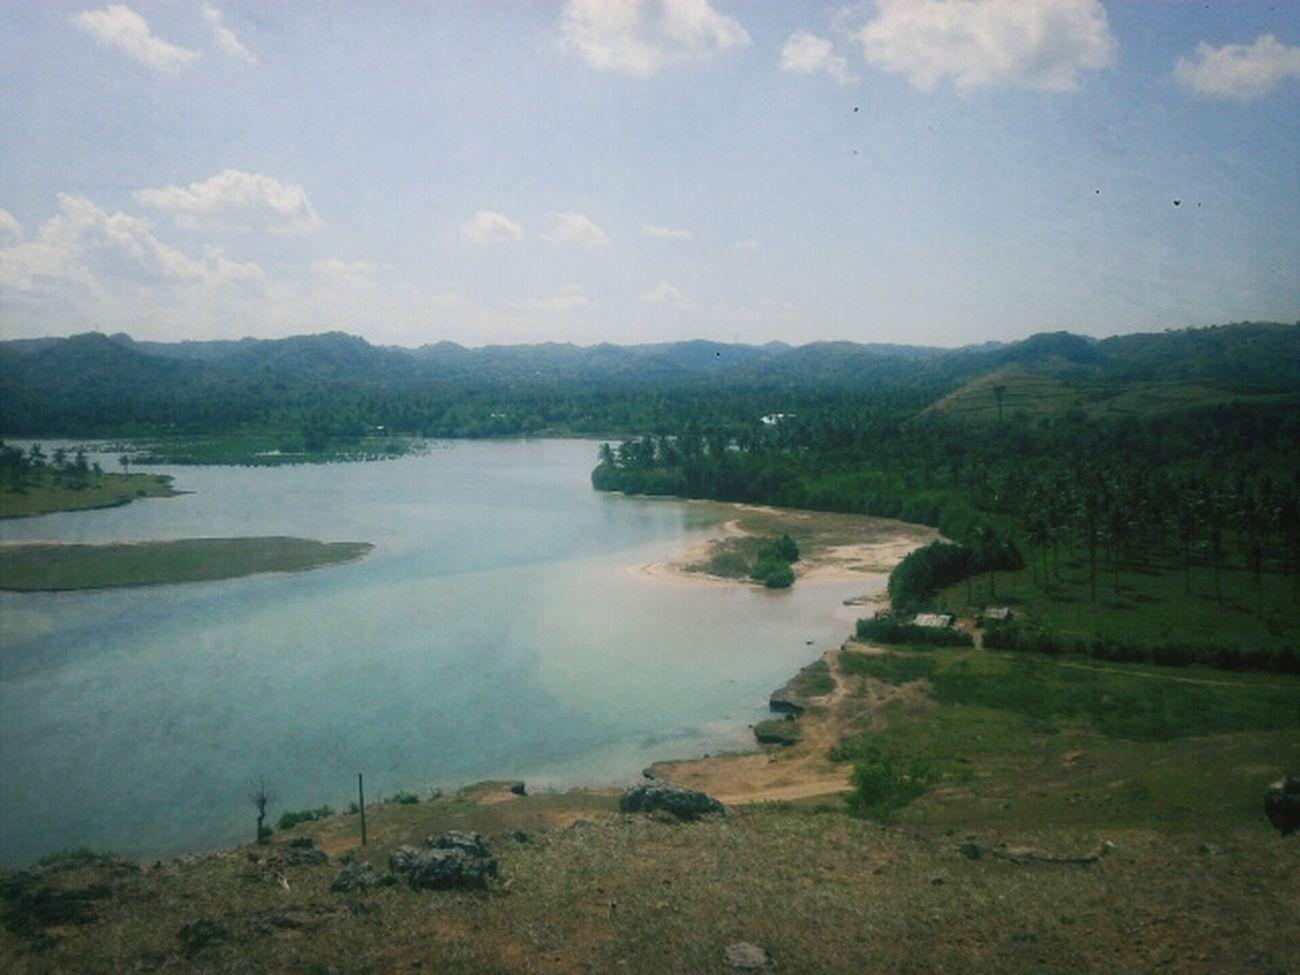 My lombok island